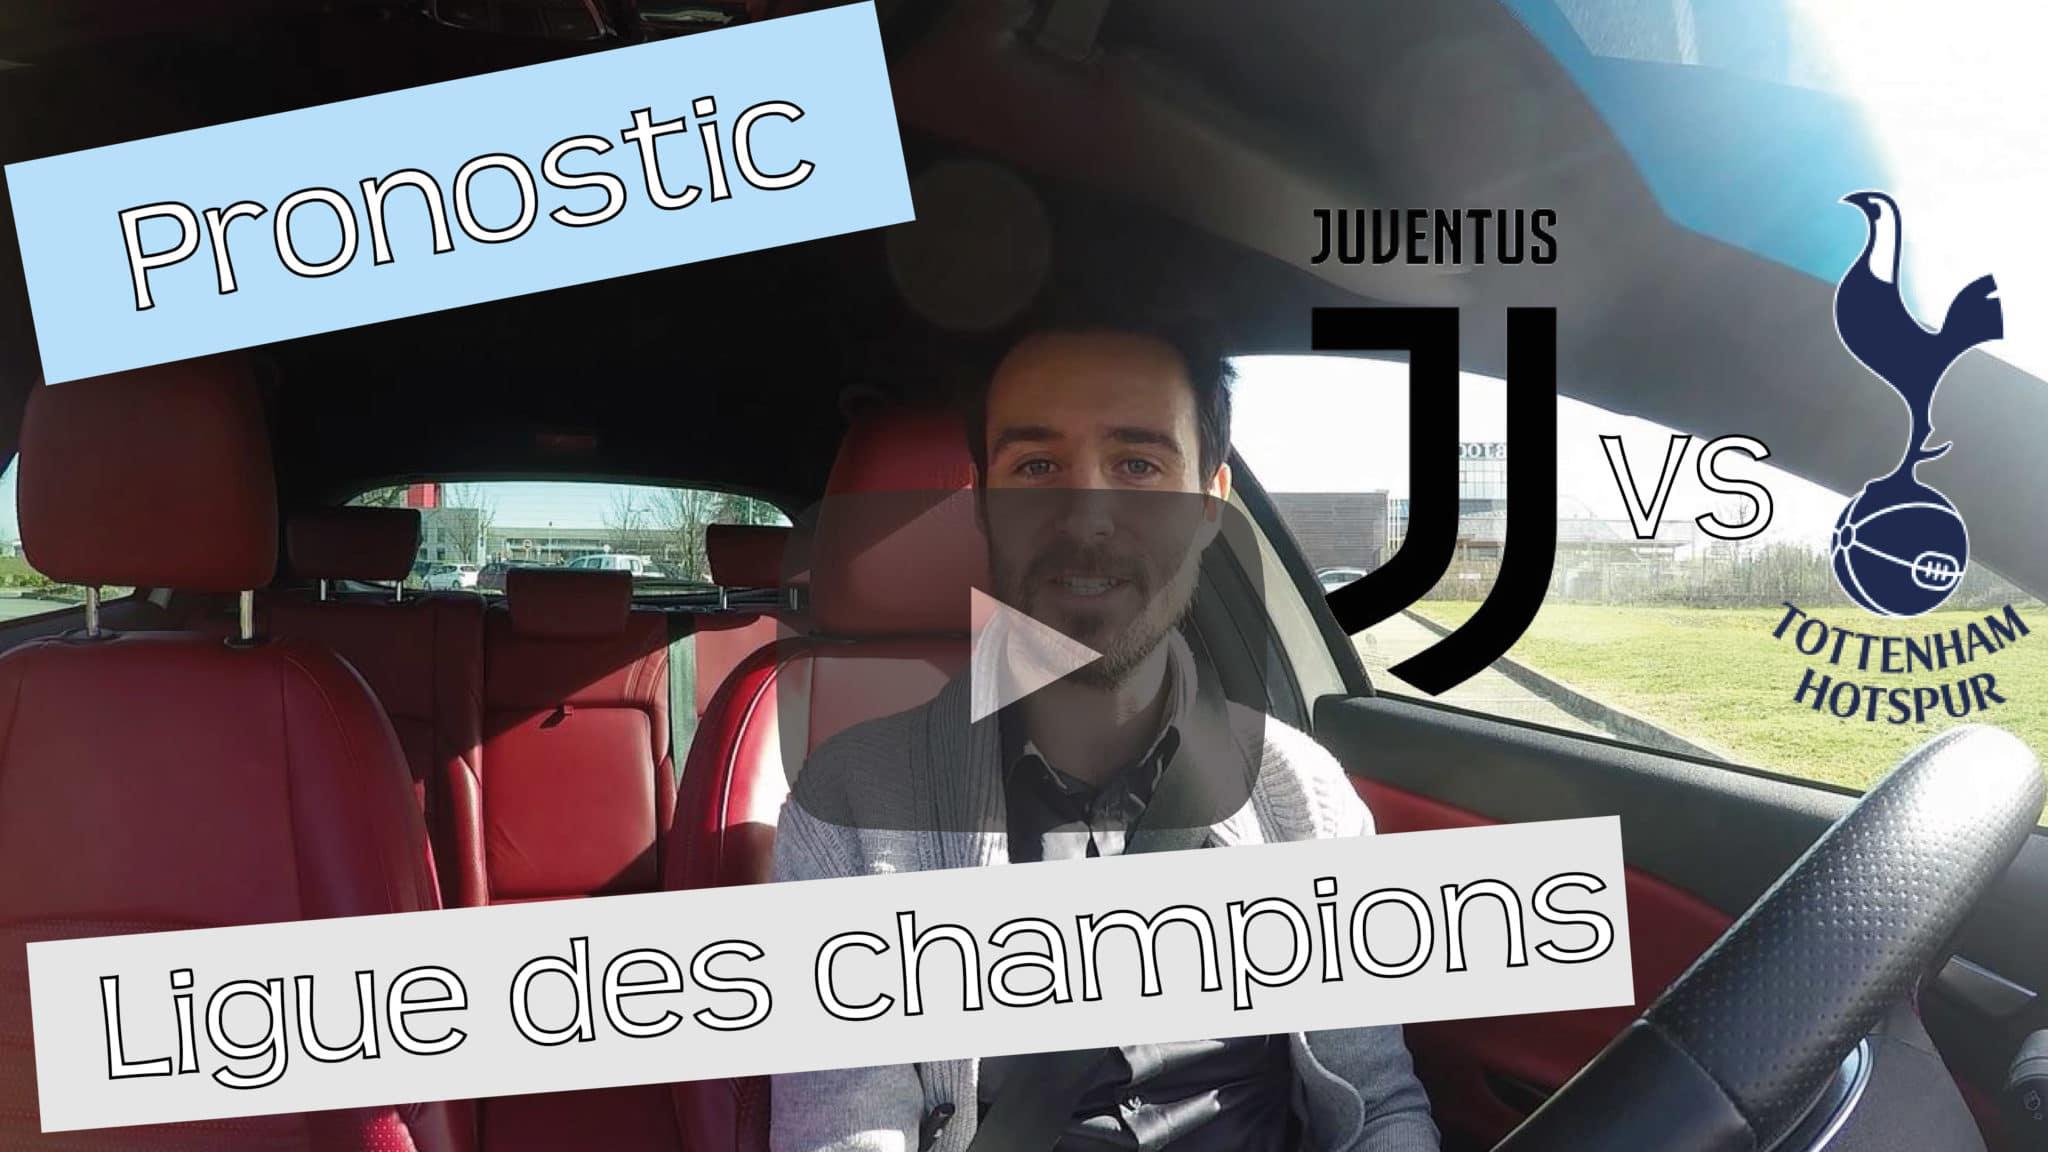 [Public] Pronostic 7 – Juventus / Tottenham – Ligue des champions